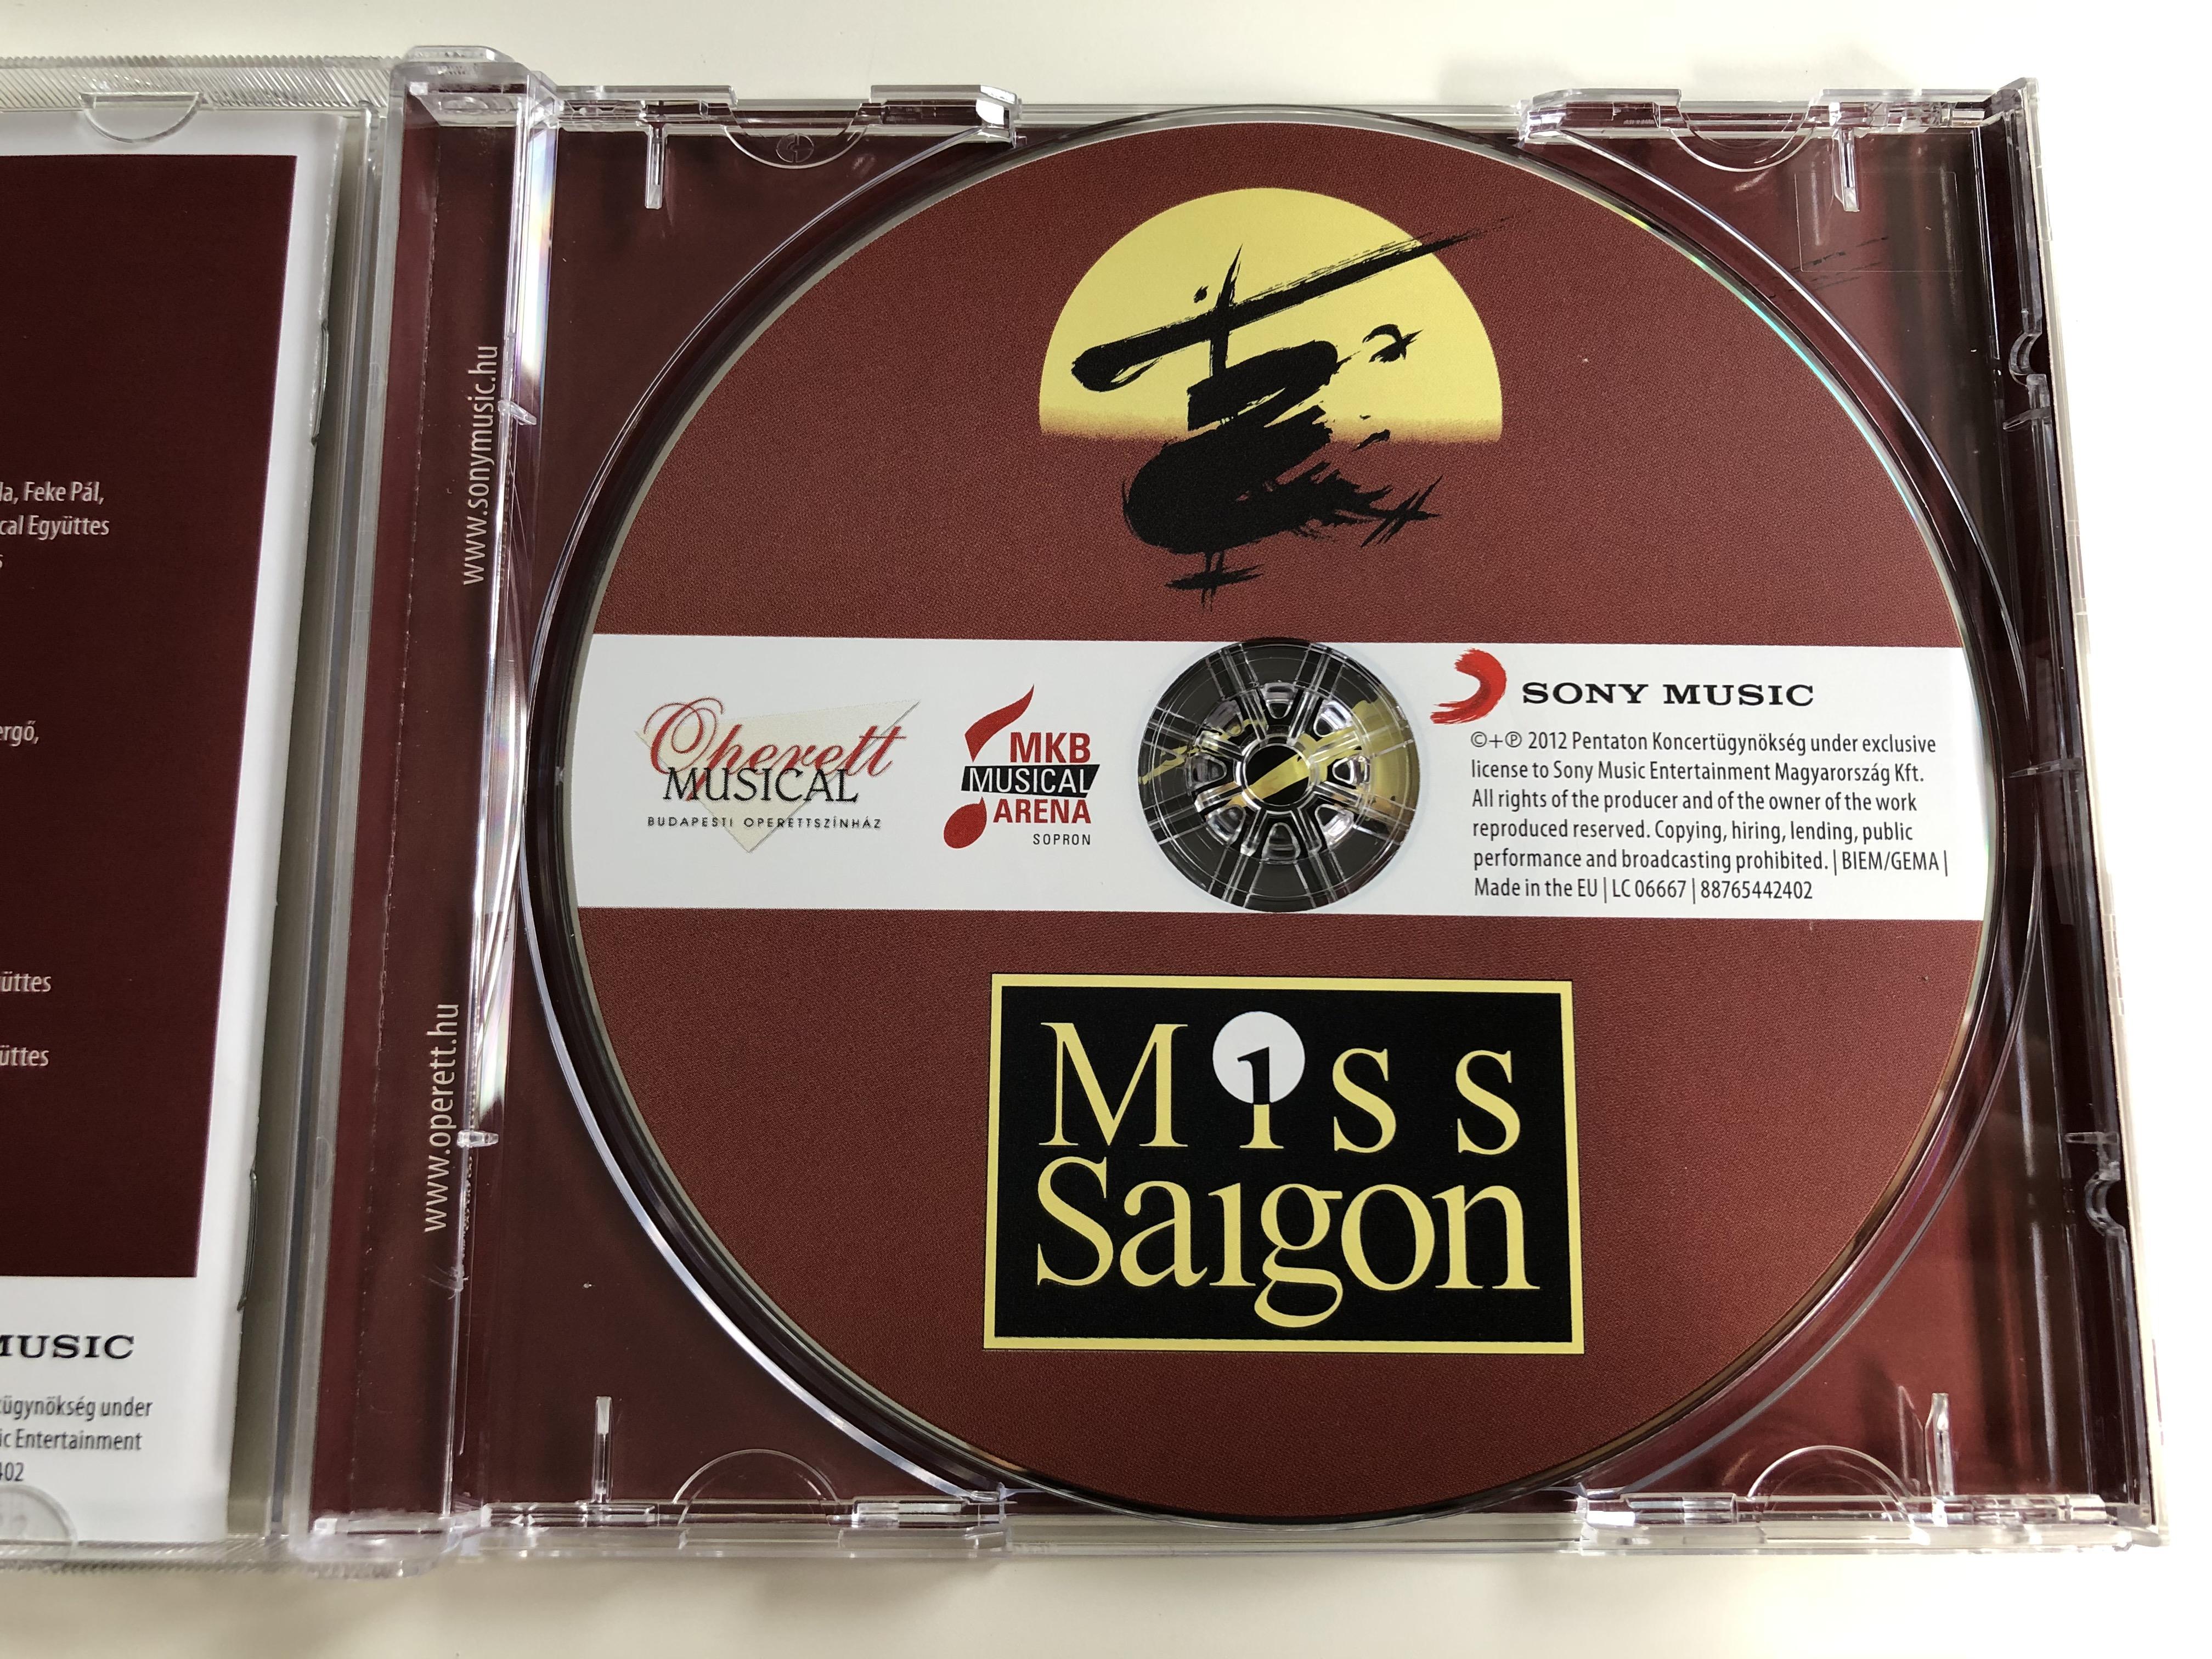 budapest-operettszinhaz-mkb-musical-arena-miss-saigon-musical-zene-claude-michael-schonberg-dalszoveg-richard-maltby-jr.-es-alain-boubil-sony-music-entertainment-audio-cd-2012-887654424020-7-.jpg